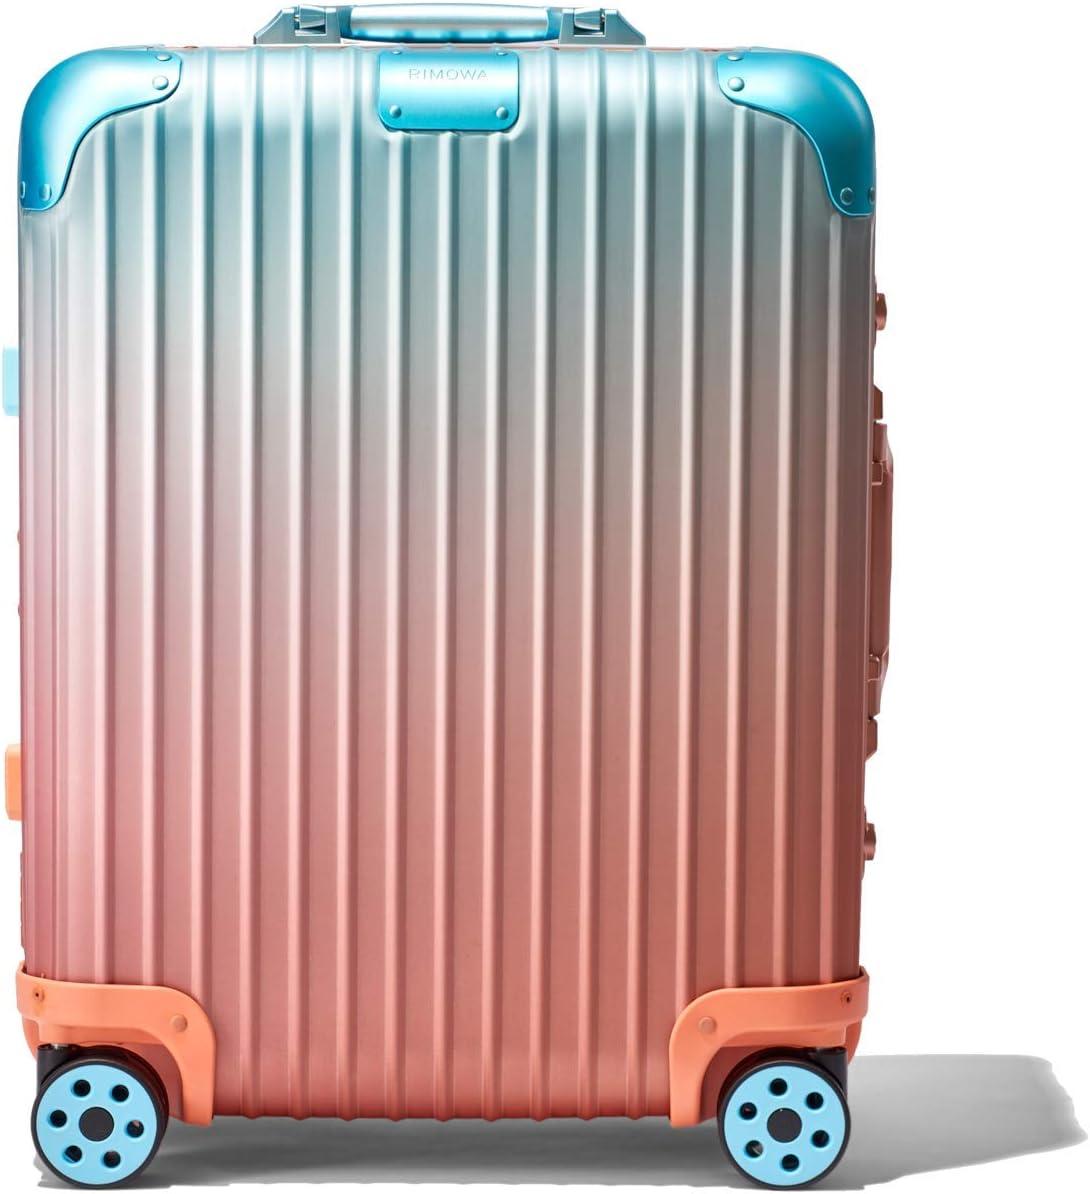 RIMOWA X Alex Israel Original Cabin Plus MULTIWHEEL SUITECASE Orange/Pink/Blue Limited Edition